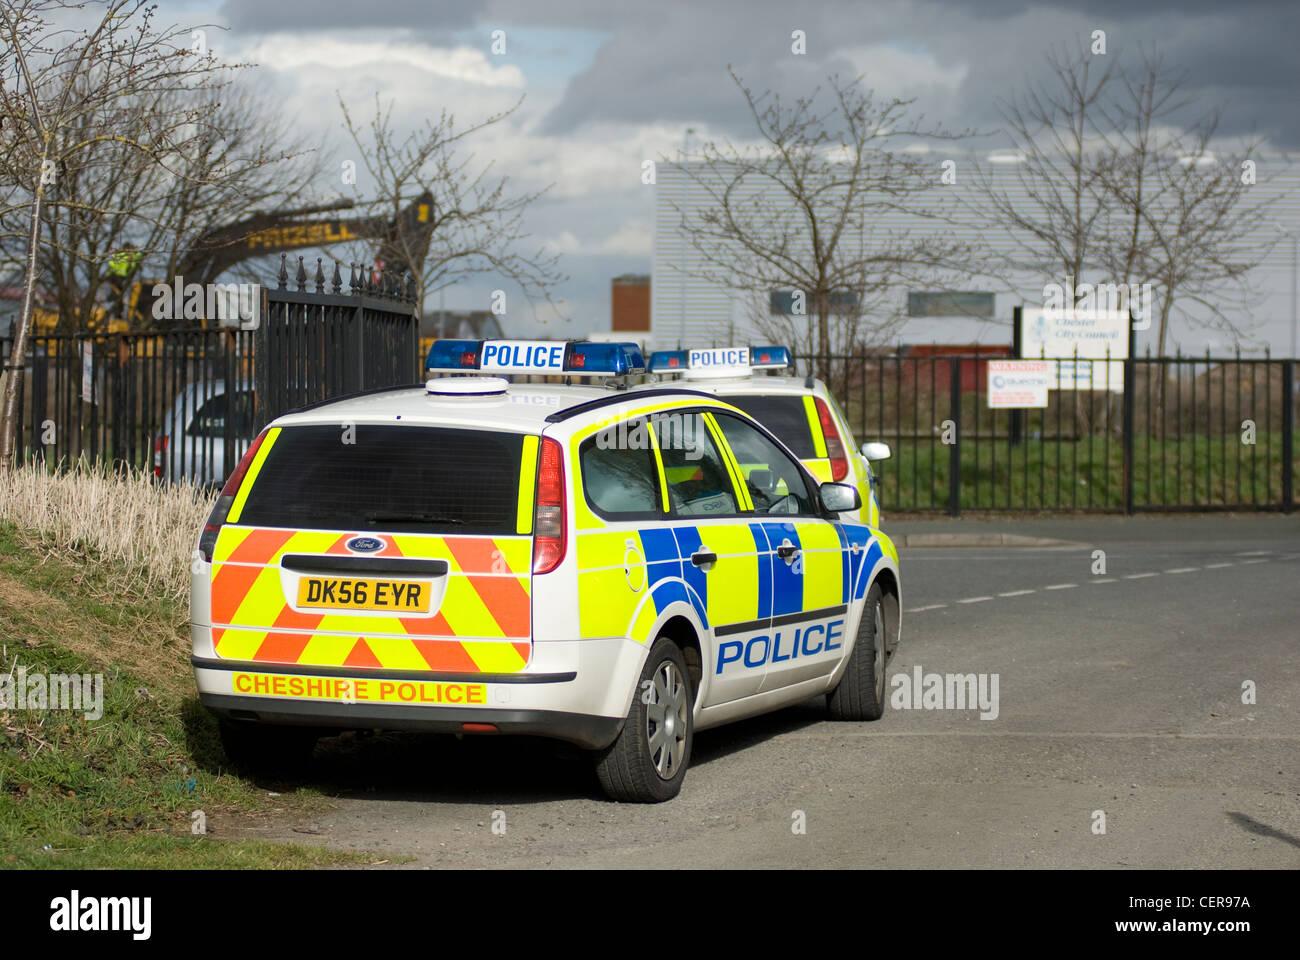 Uk police car at the scene of a civil disturbance - Stock Image